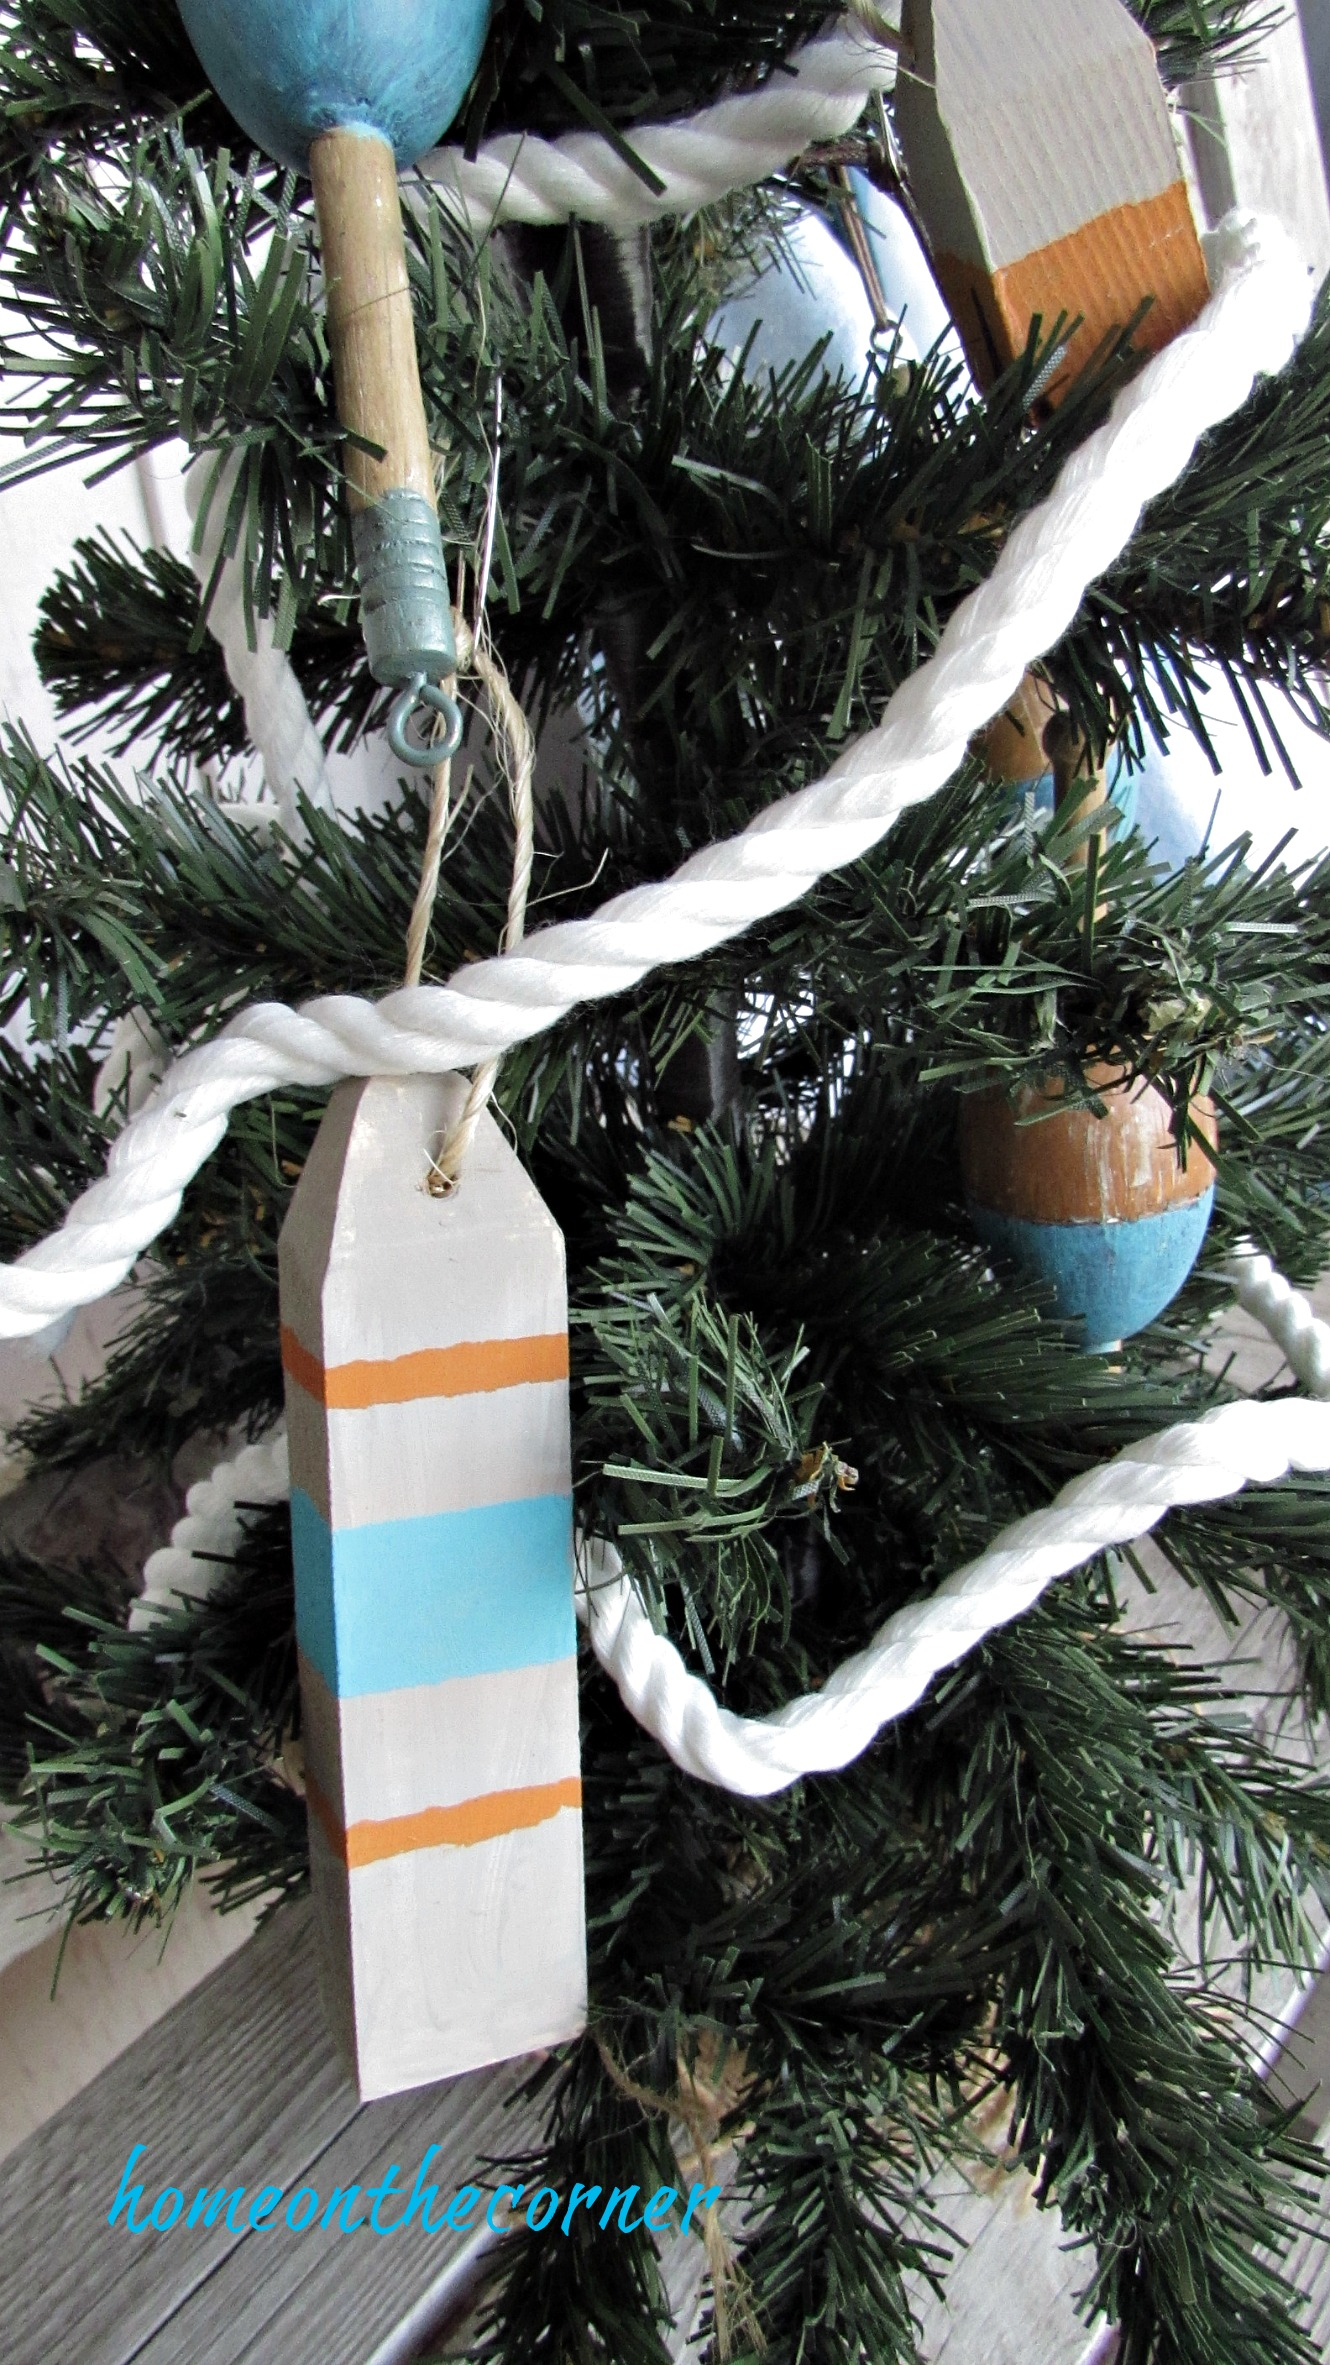 Christmas Wooden Buoy Ornament Turquoise, orange, grey